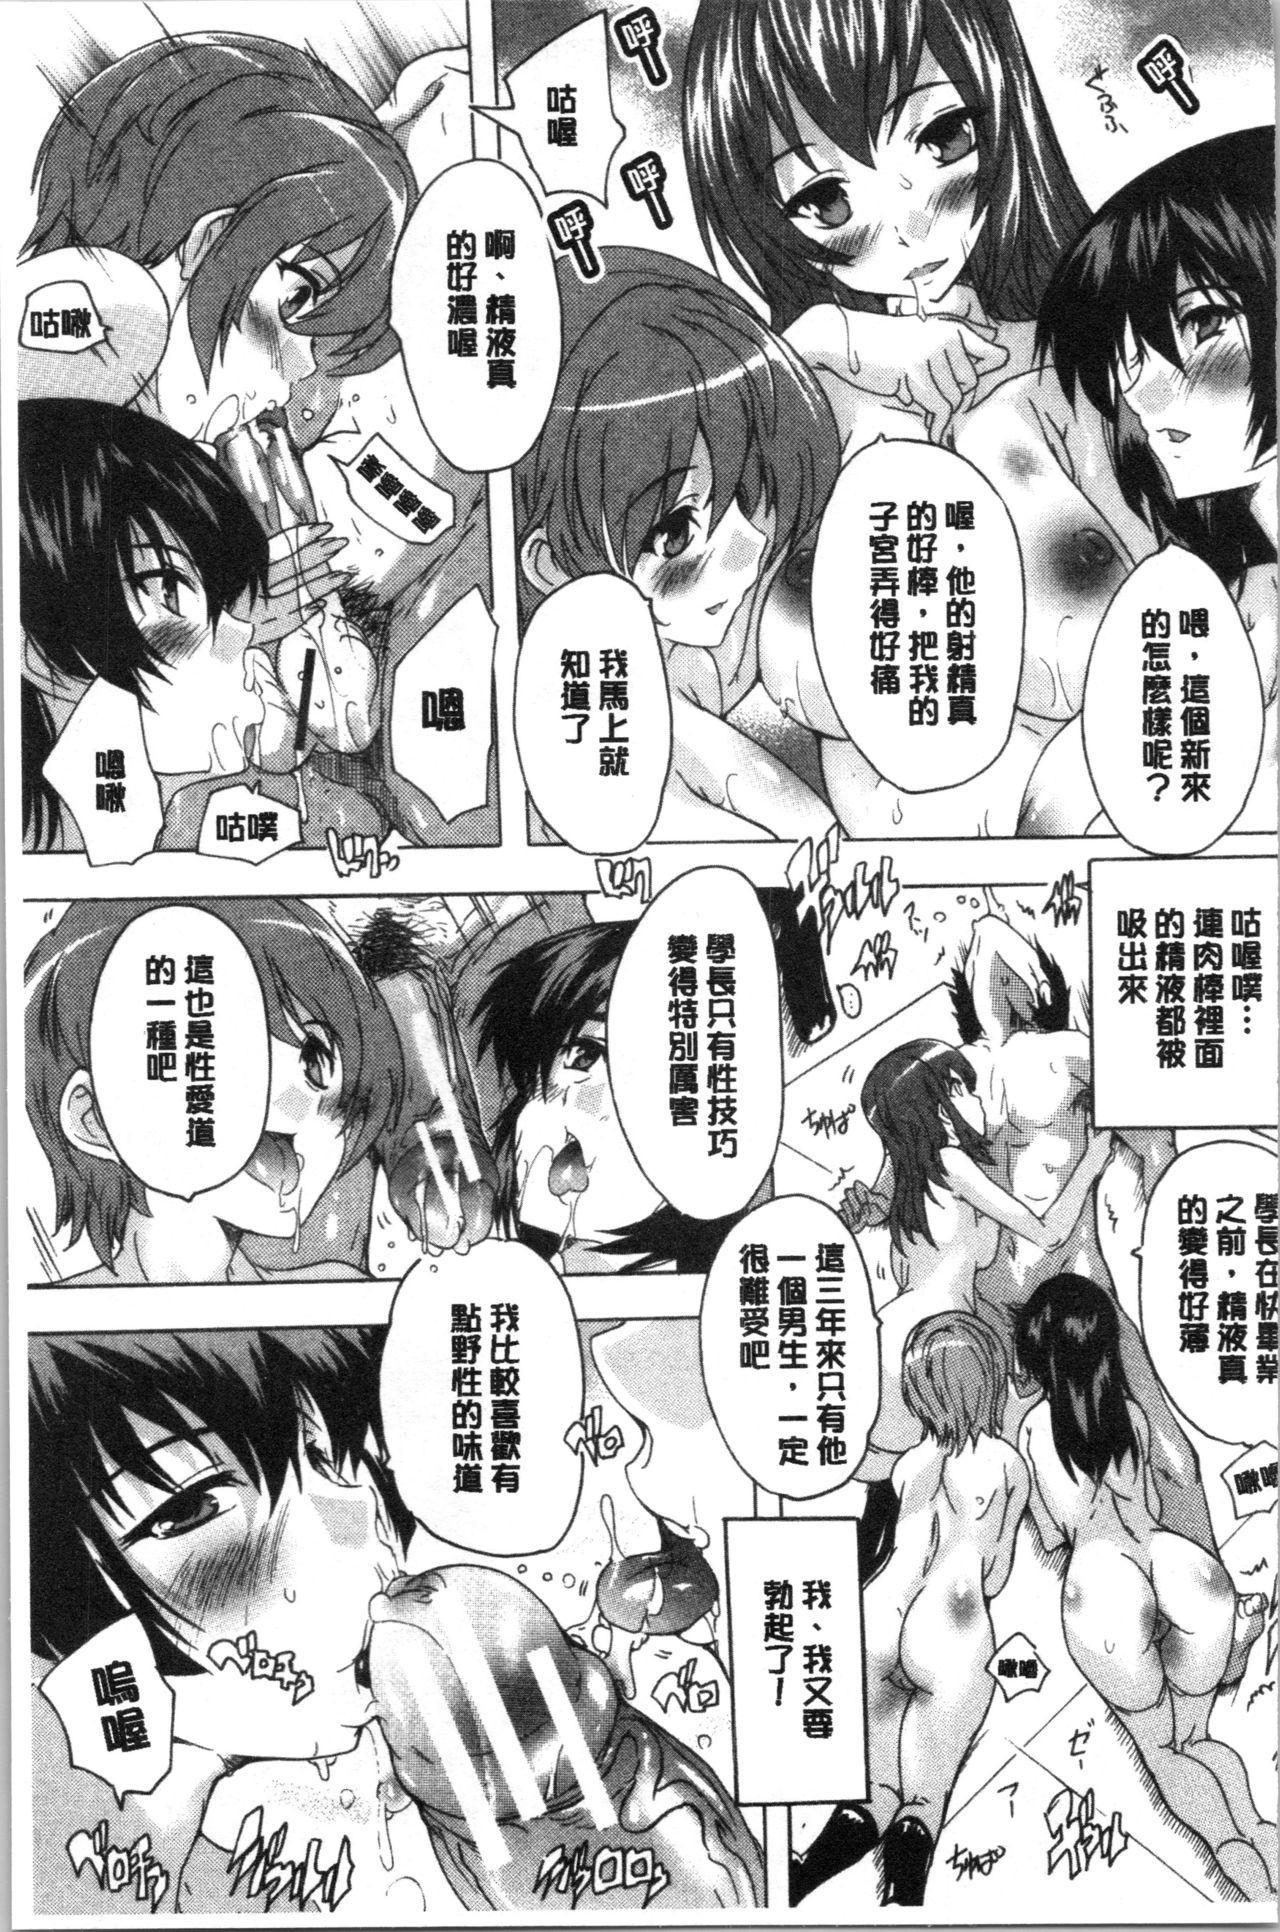 [Natsuka Q-Ya] Hisshuu!! Sex-bu - SEIGI-DO The Ultimate Martial Arts   必修!!性愛淫交部 [Chinese] 23